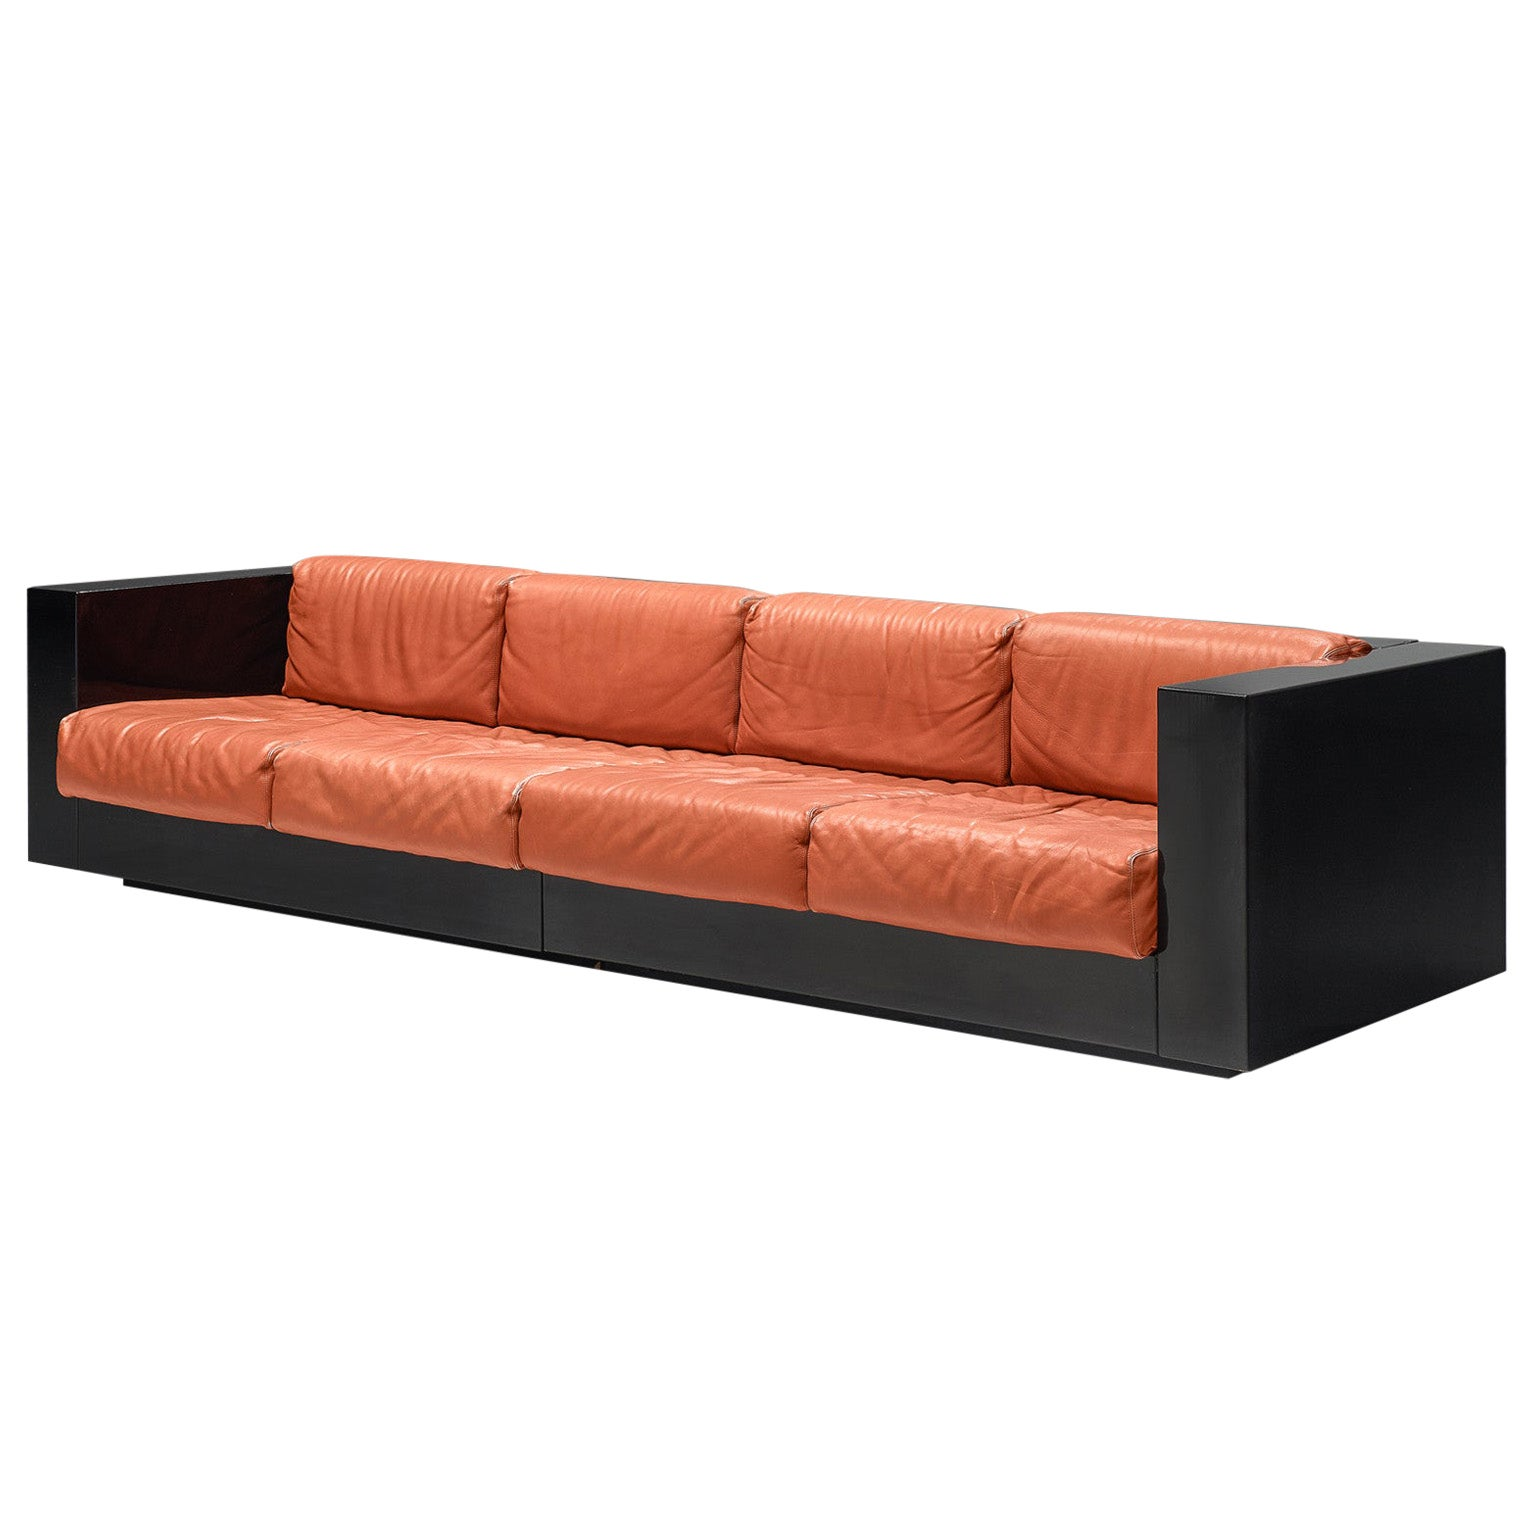 Vignelli Saratoga Large Sofa in Red Leather